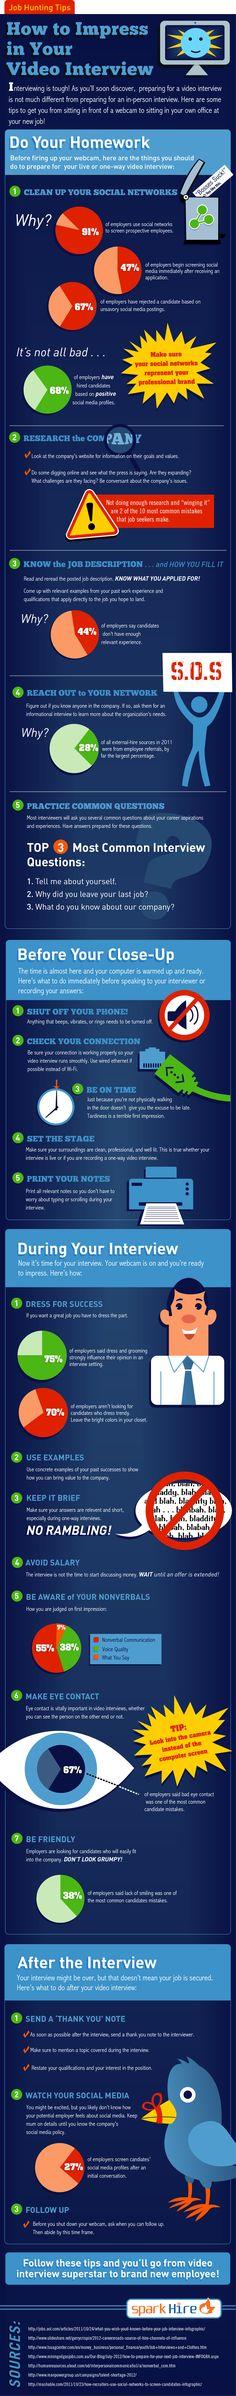 How to Impress on a Video Interview [infographic]  [www.dodgen.co] #DodgenCo #careerguidance